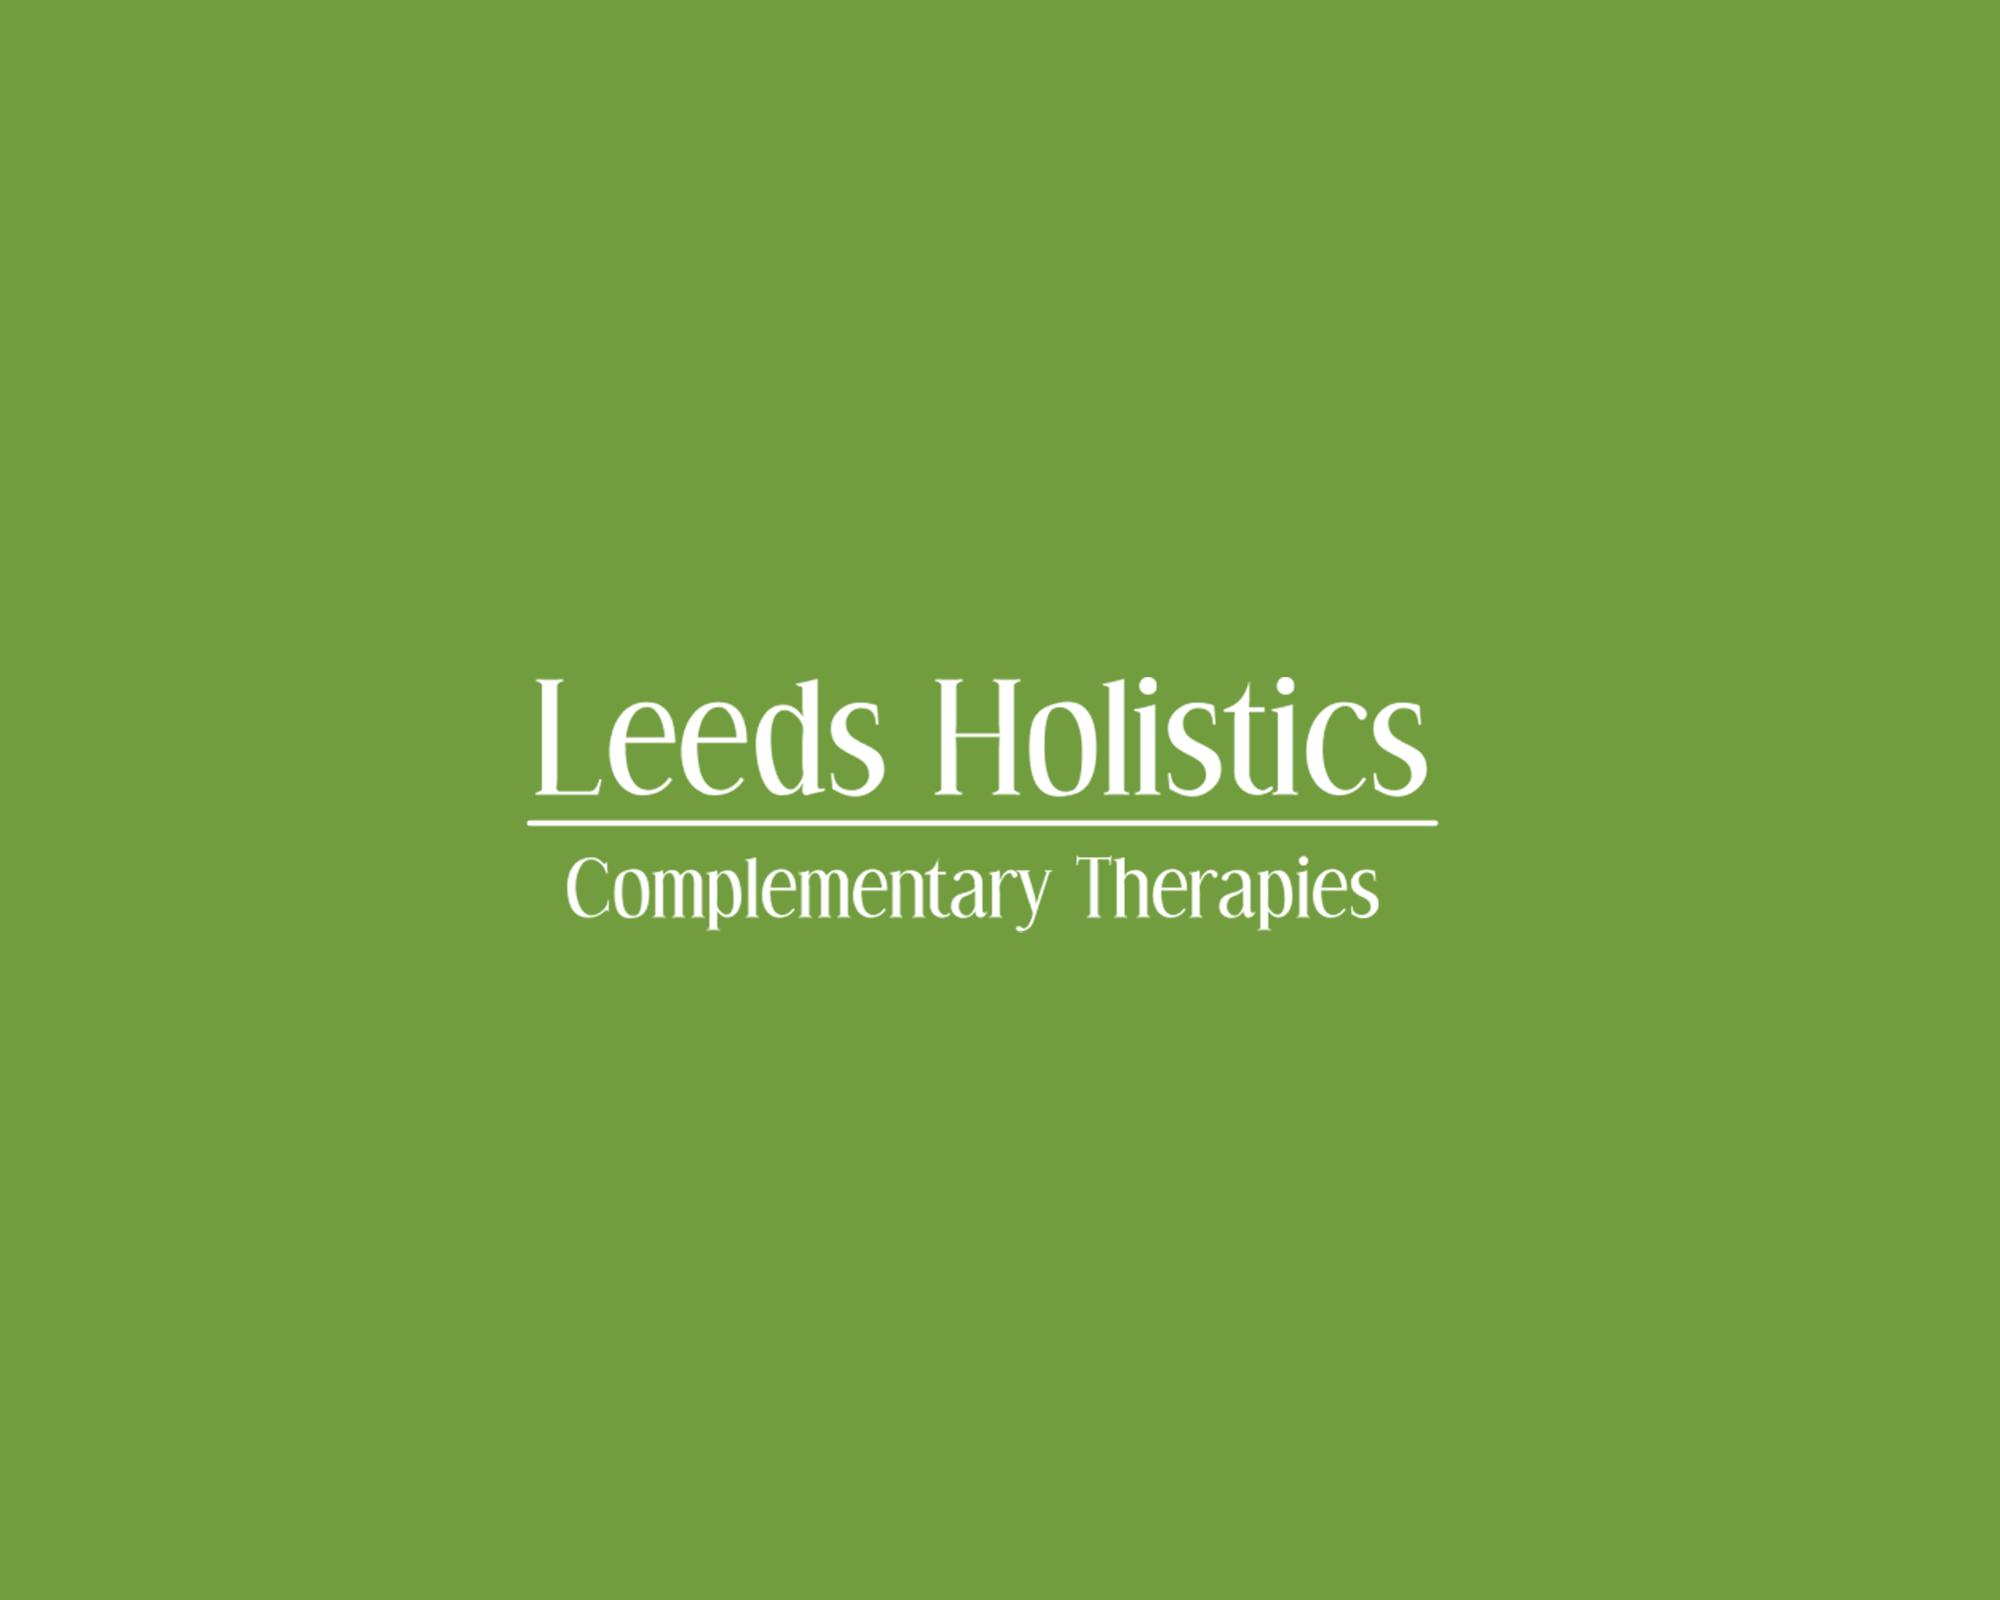 leeds holistics Logo